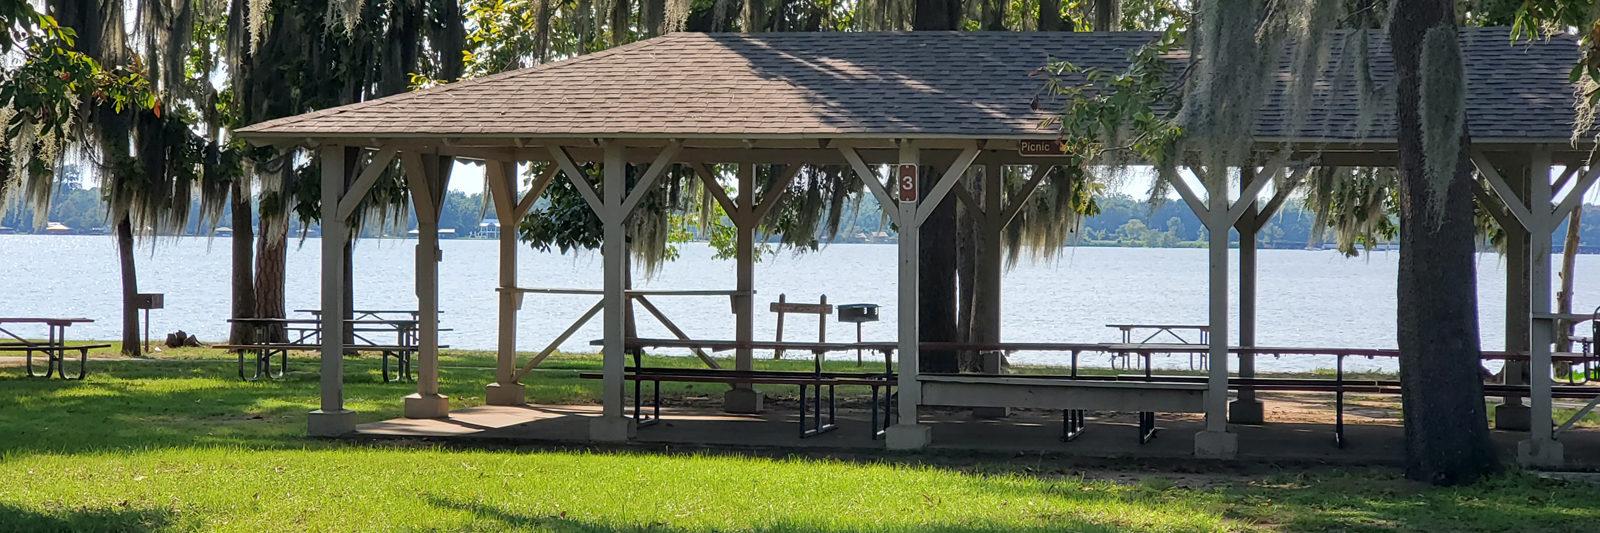 Lake Blackshear Header Picnic Shelters For Rent